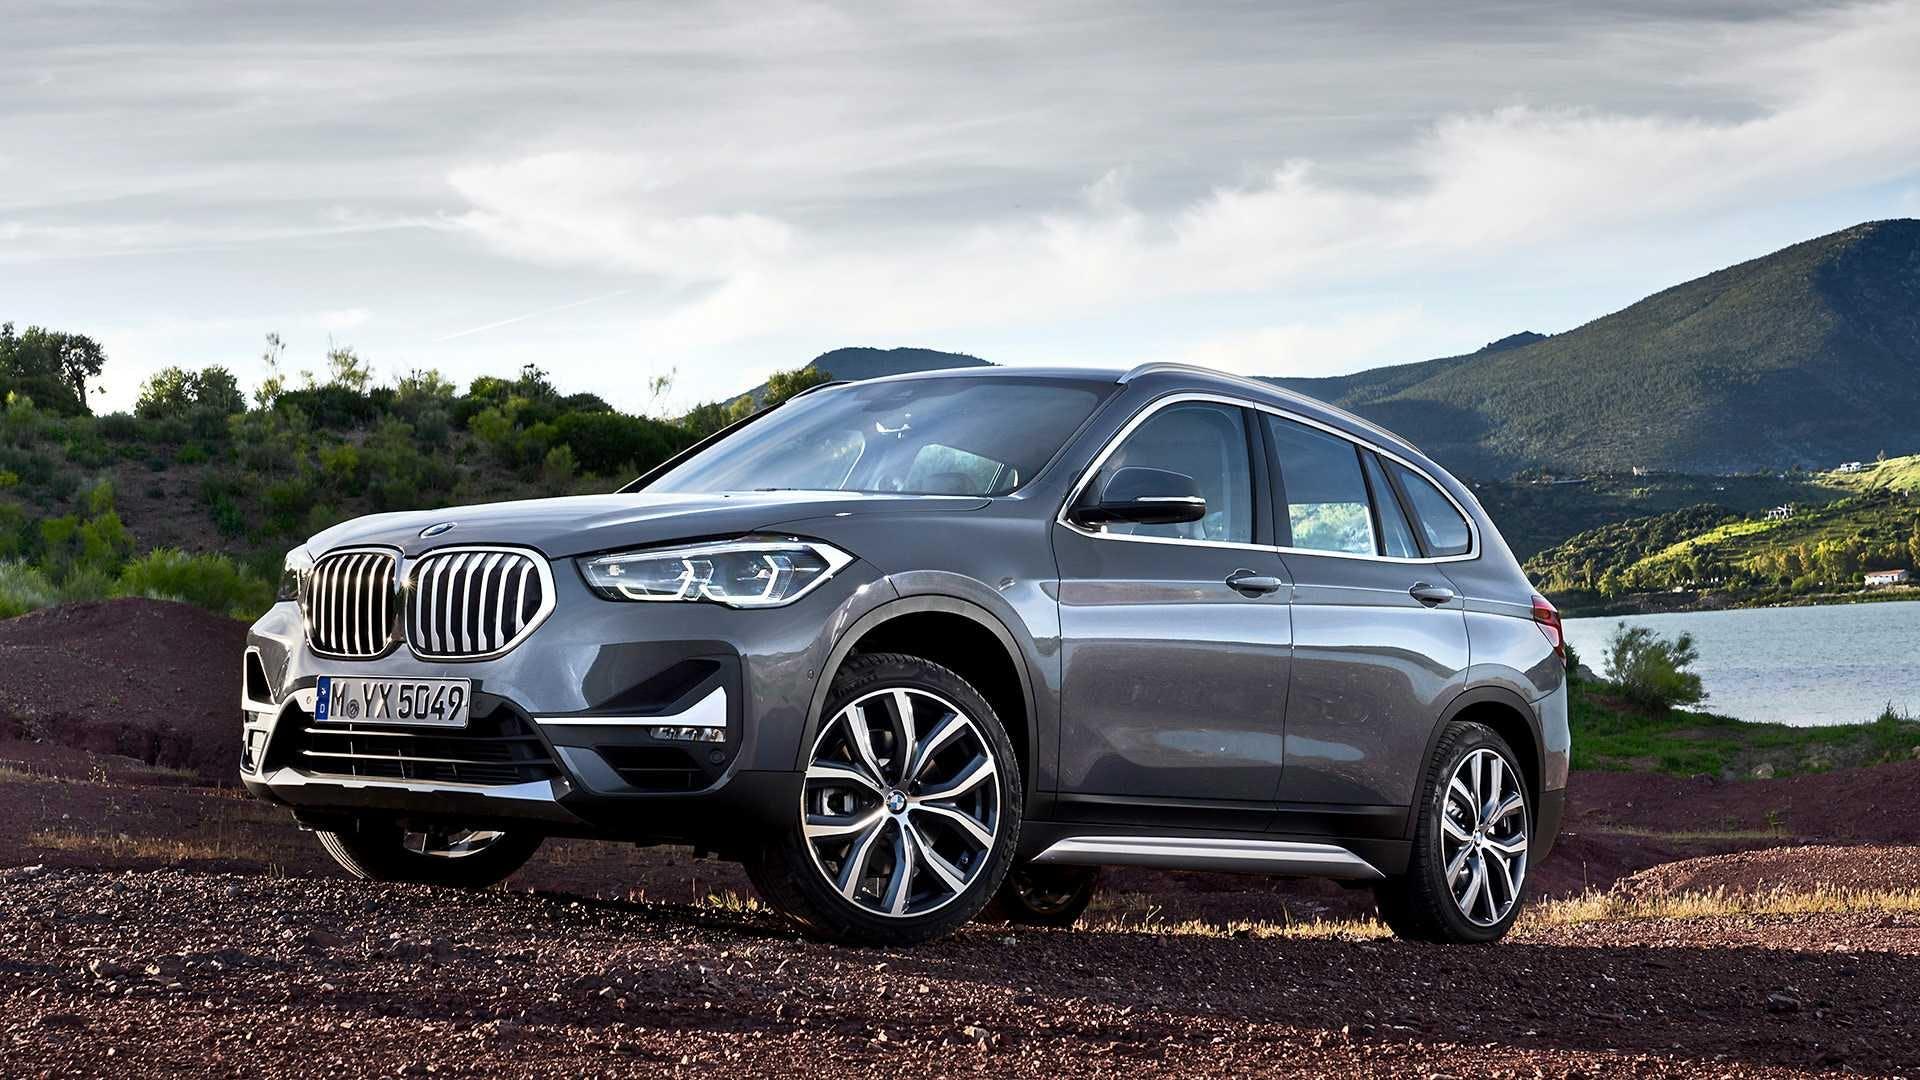 BMW X1 SUV 2020